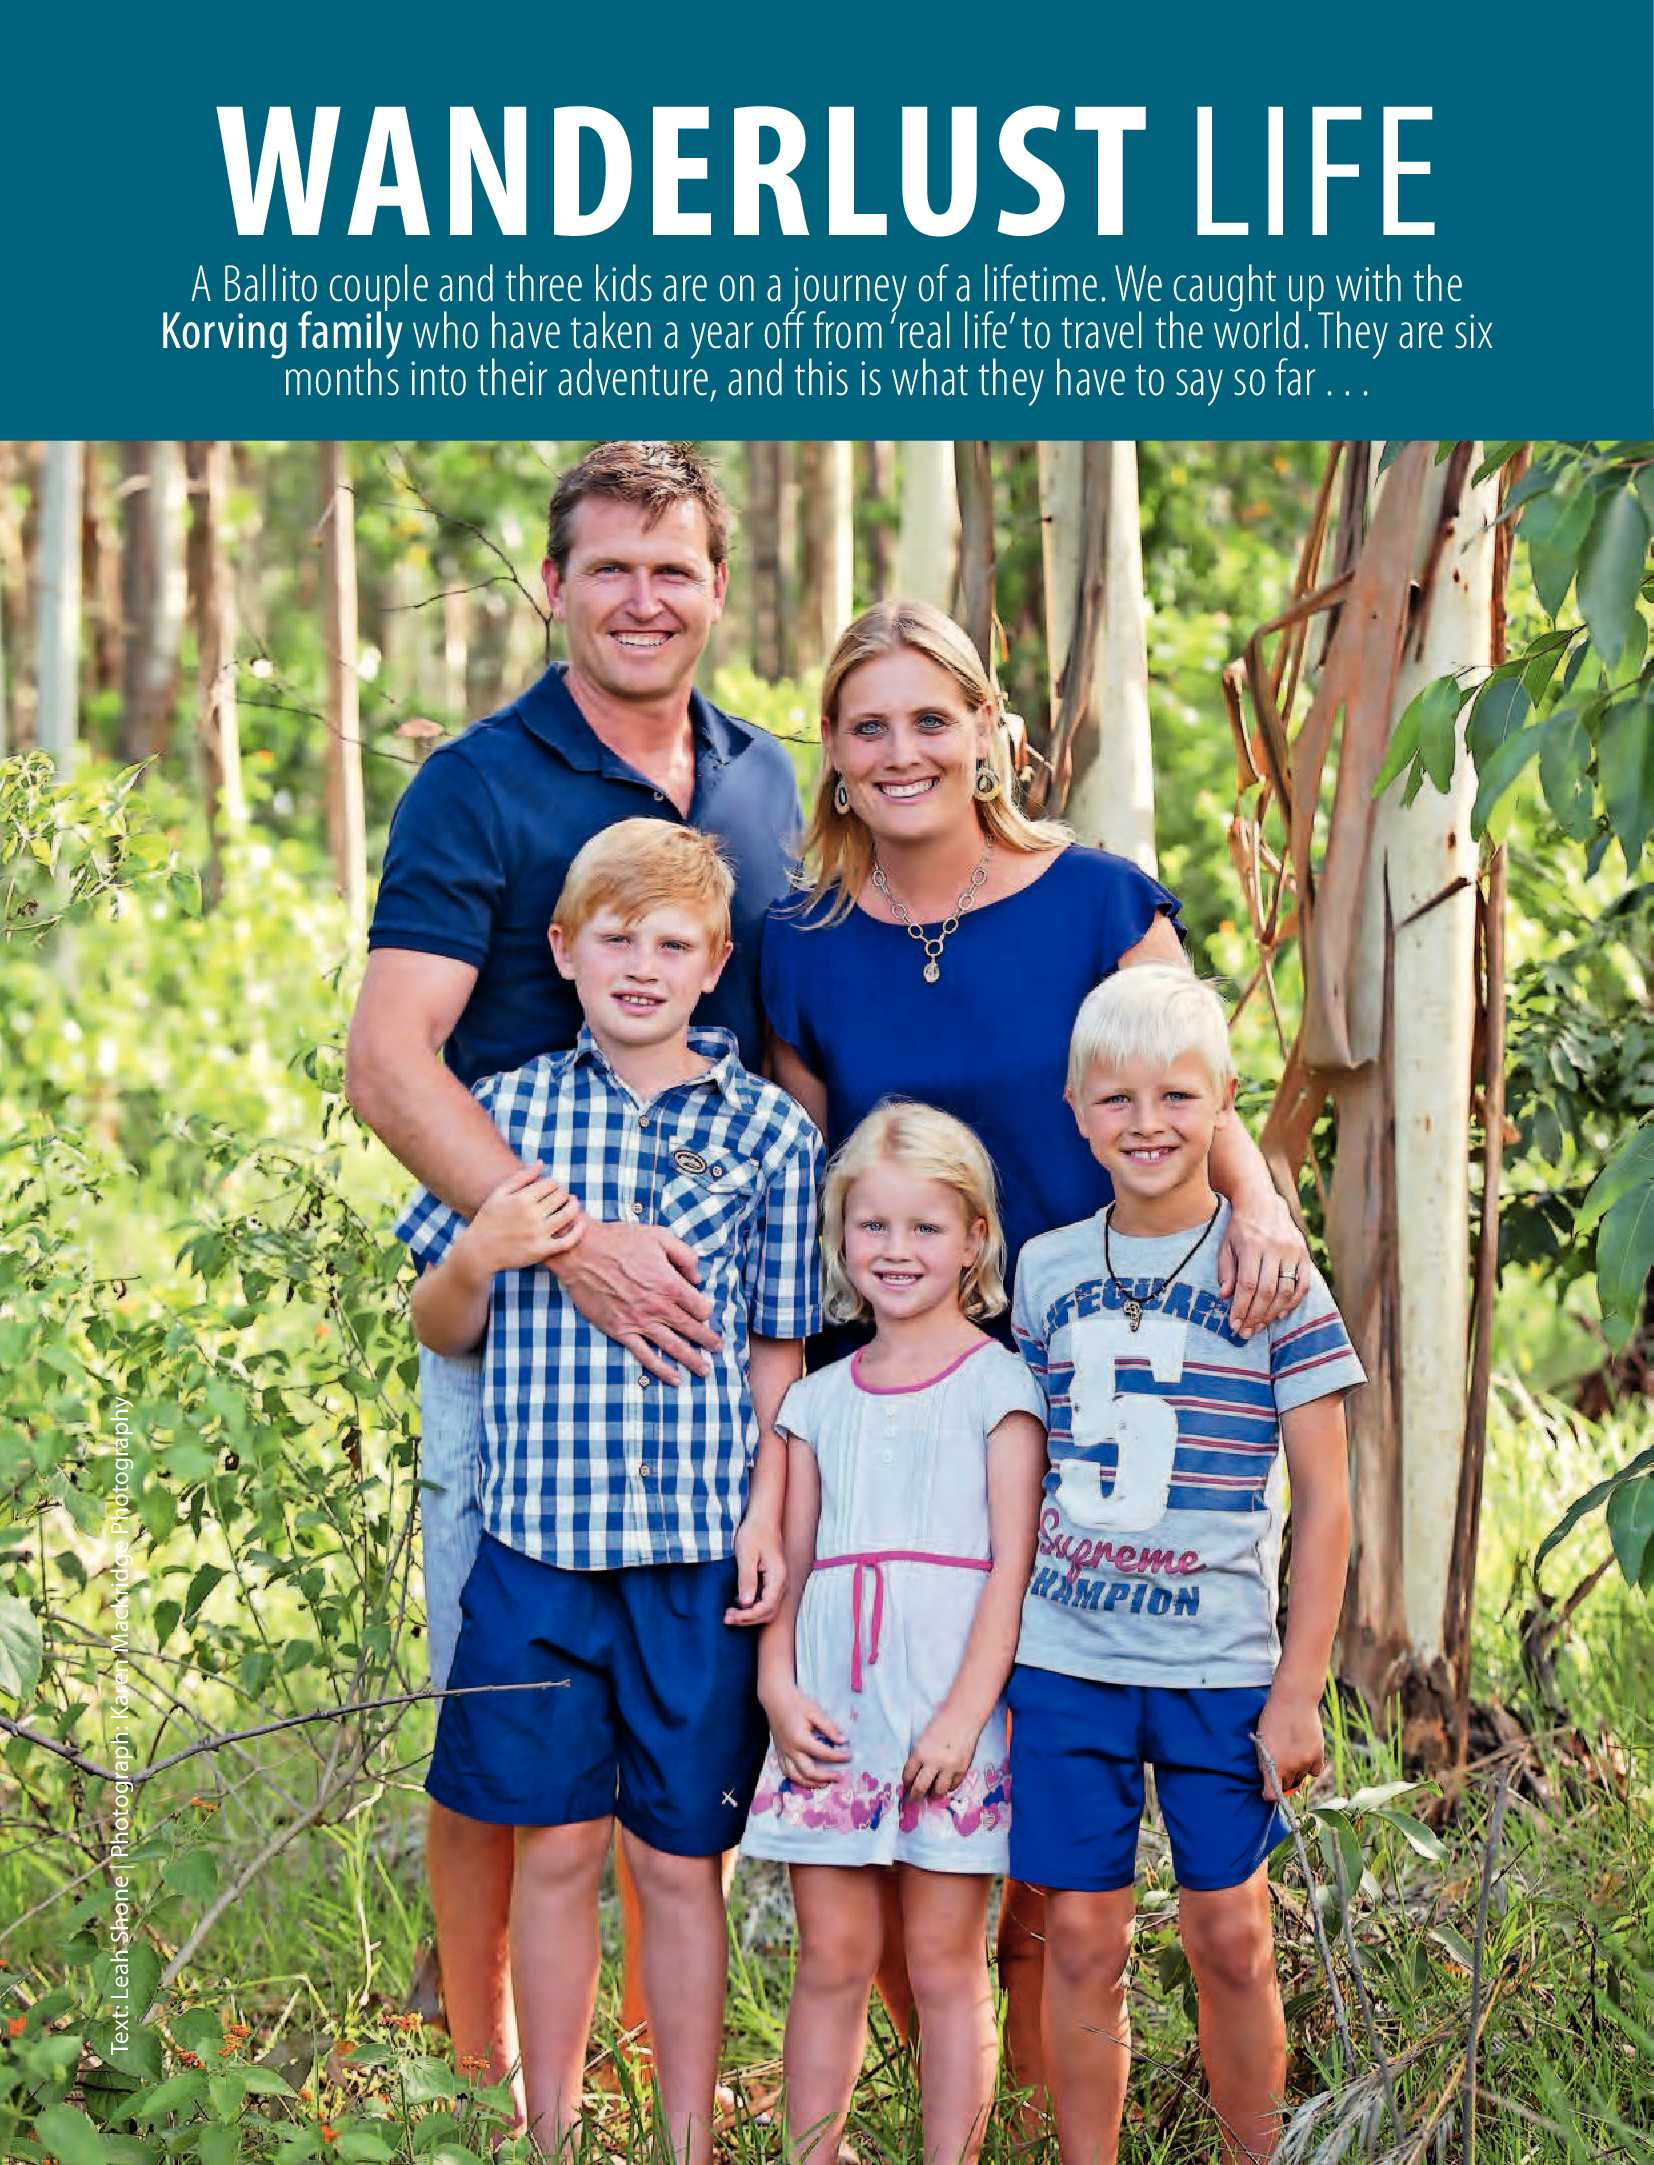 get-magazine-ballitoumhlanga-july-2017-2-epapers-page-22